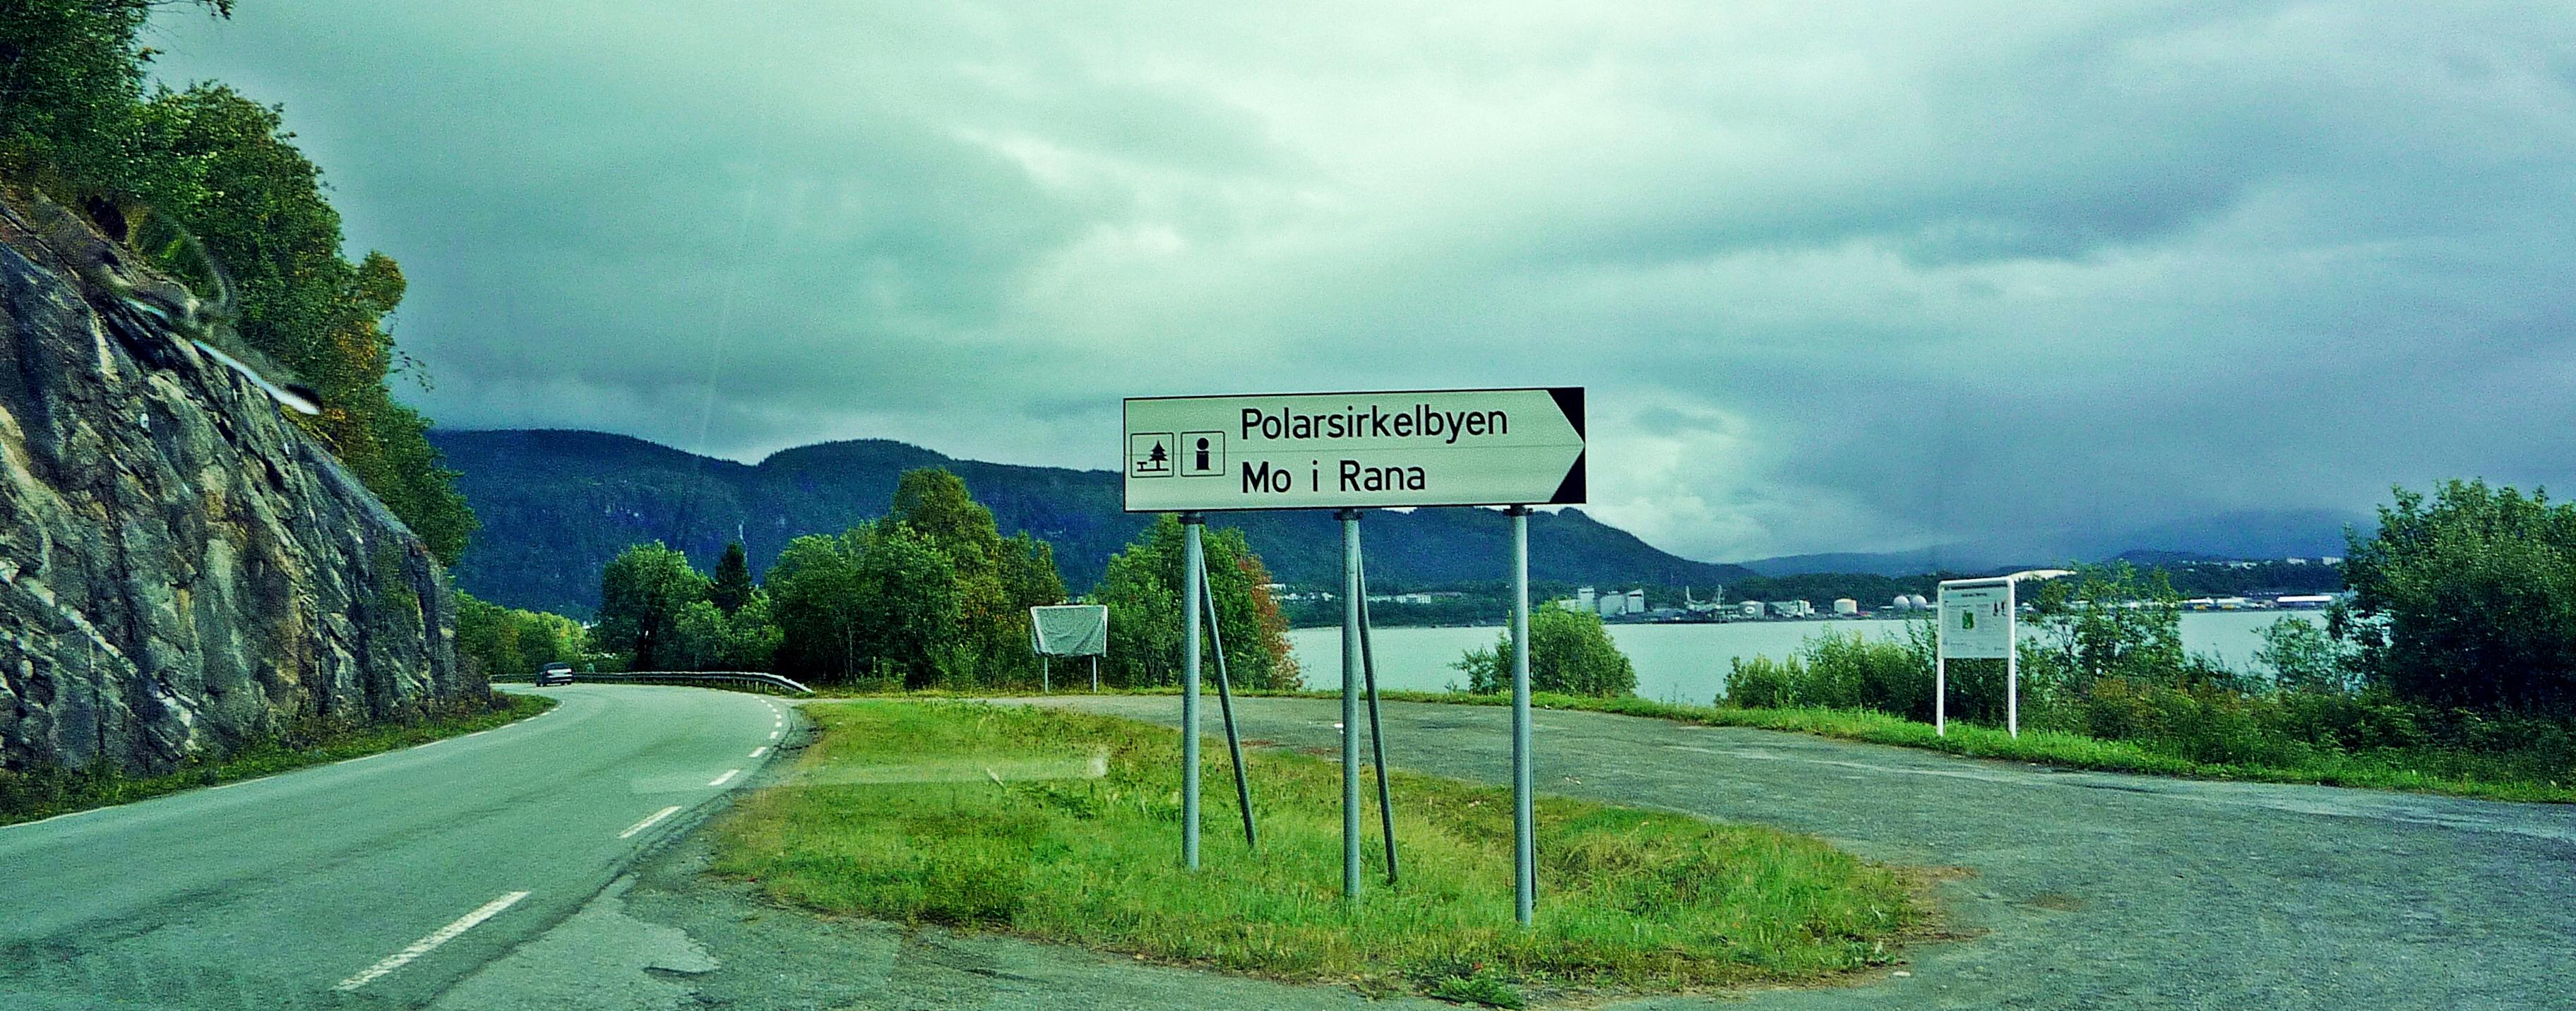 nordnorsk dialekt Mo i Rana